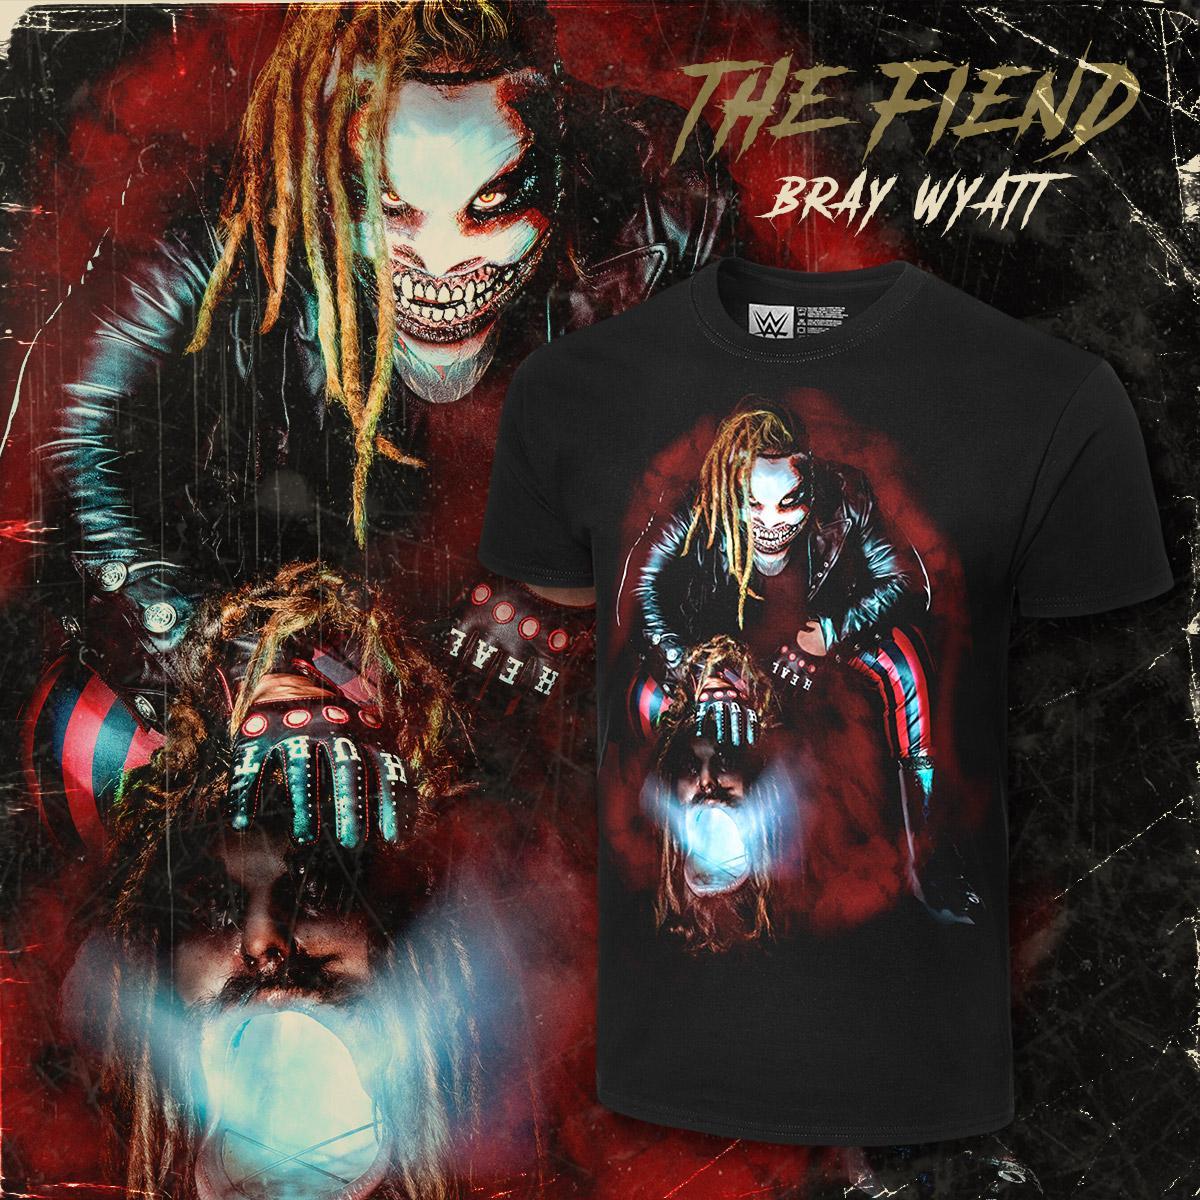 #LetMeIn - #TheFiend #BrayWyatt photo tee available now at #WWEShop! #WWE @WWEBrayWyatt